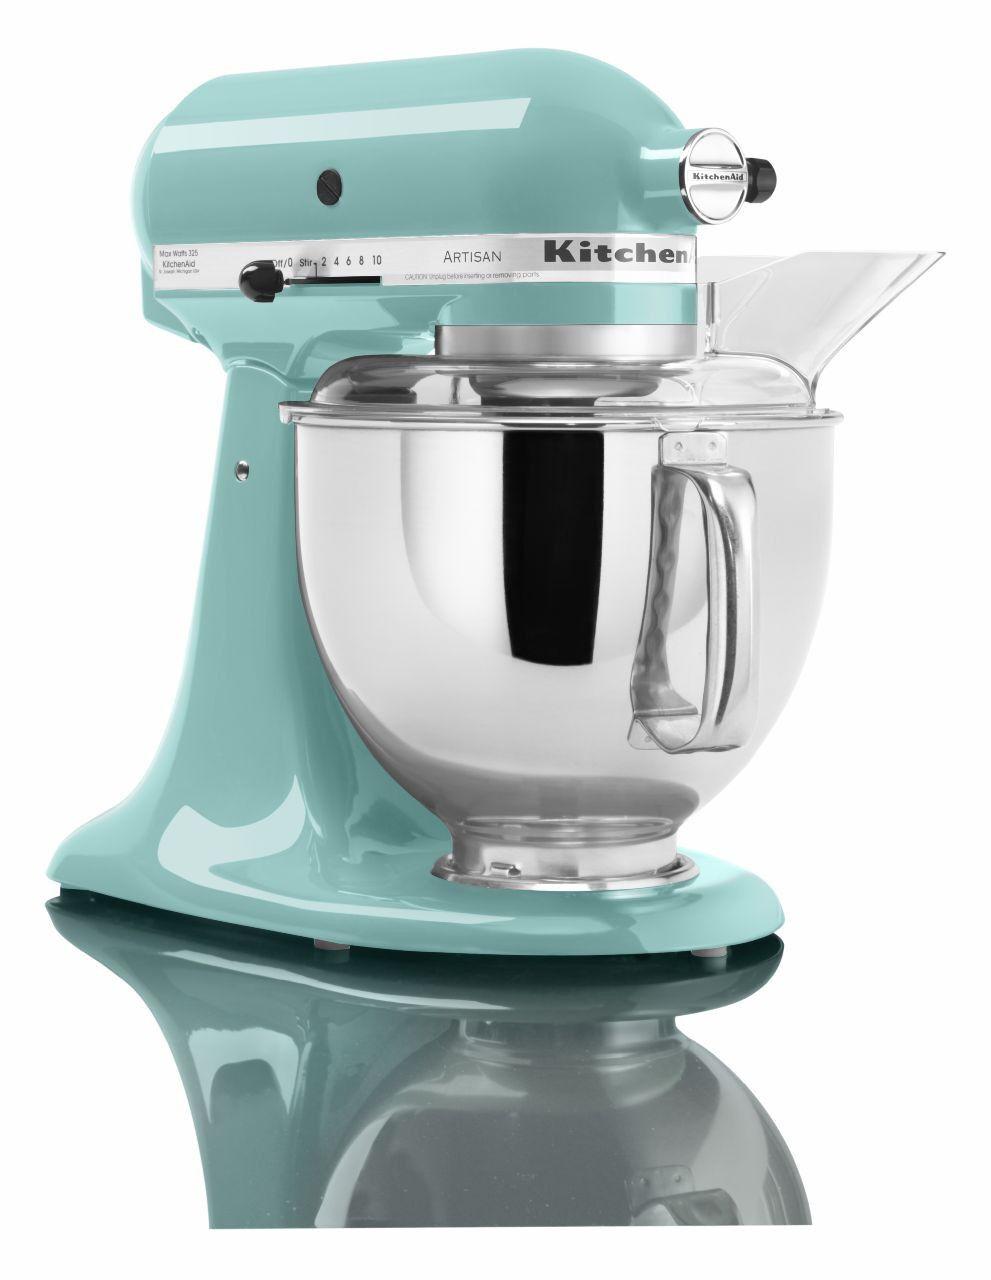 KitchenAid RRK150AQ 5 QT Kitchen Mixer Artisan Series - Aqua Sky | eBay